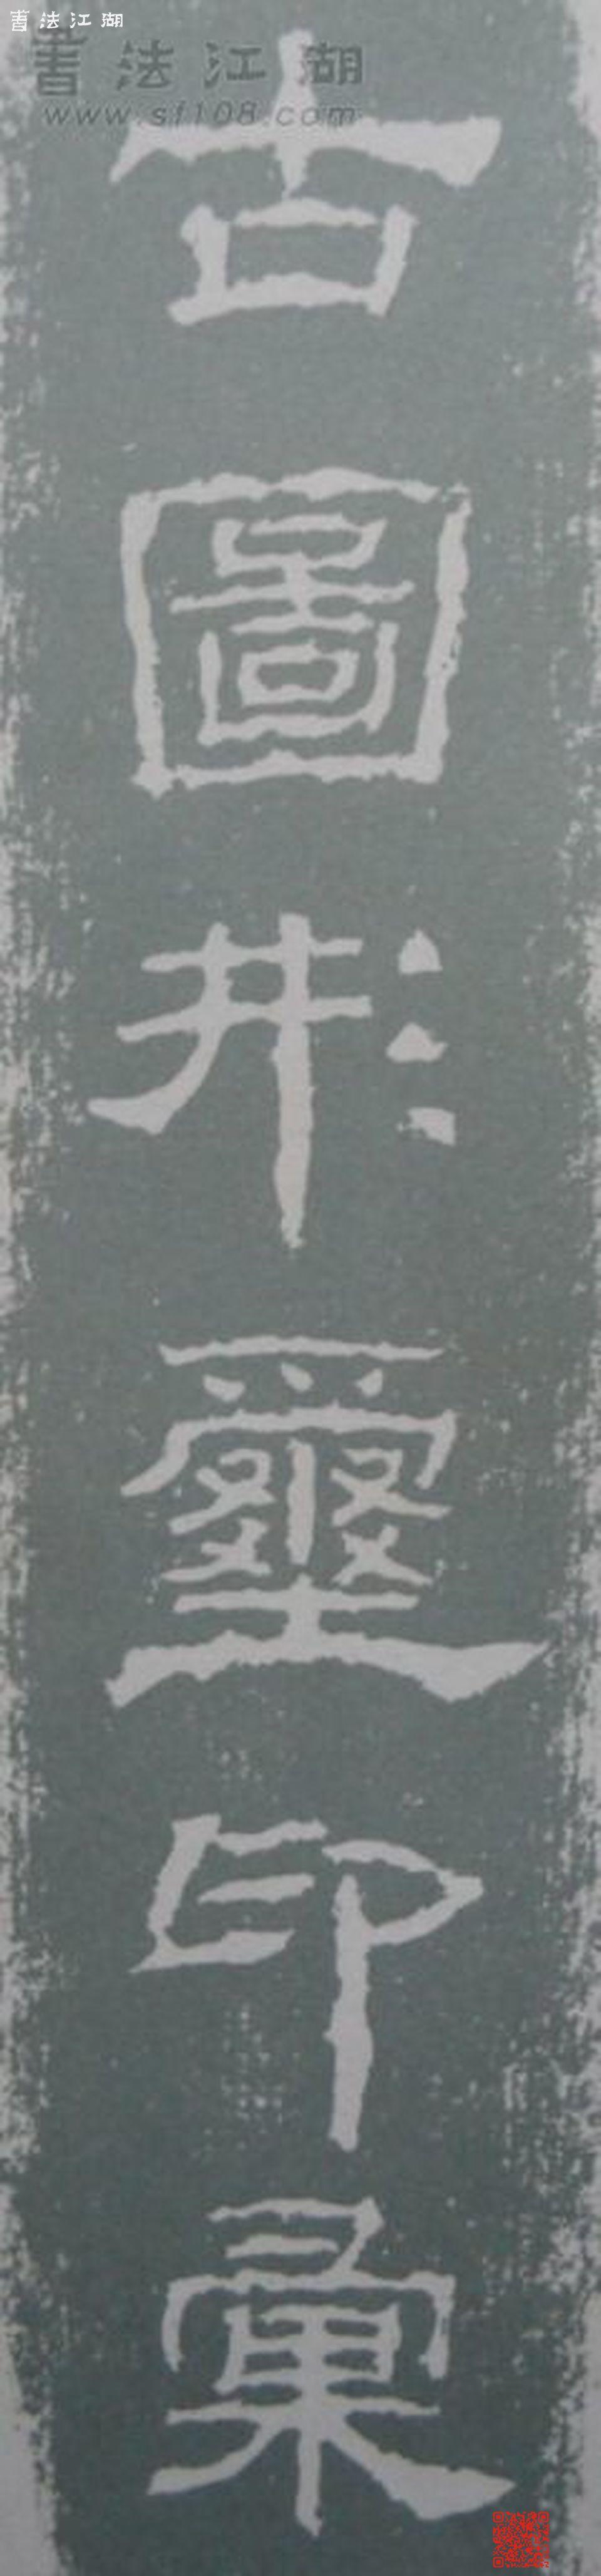 P1100338.JPG